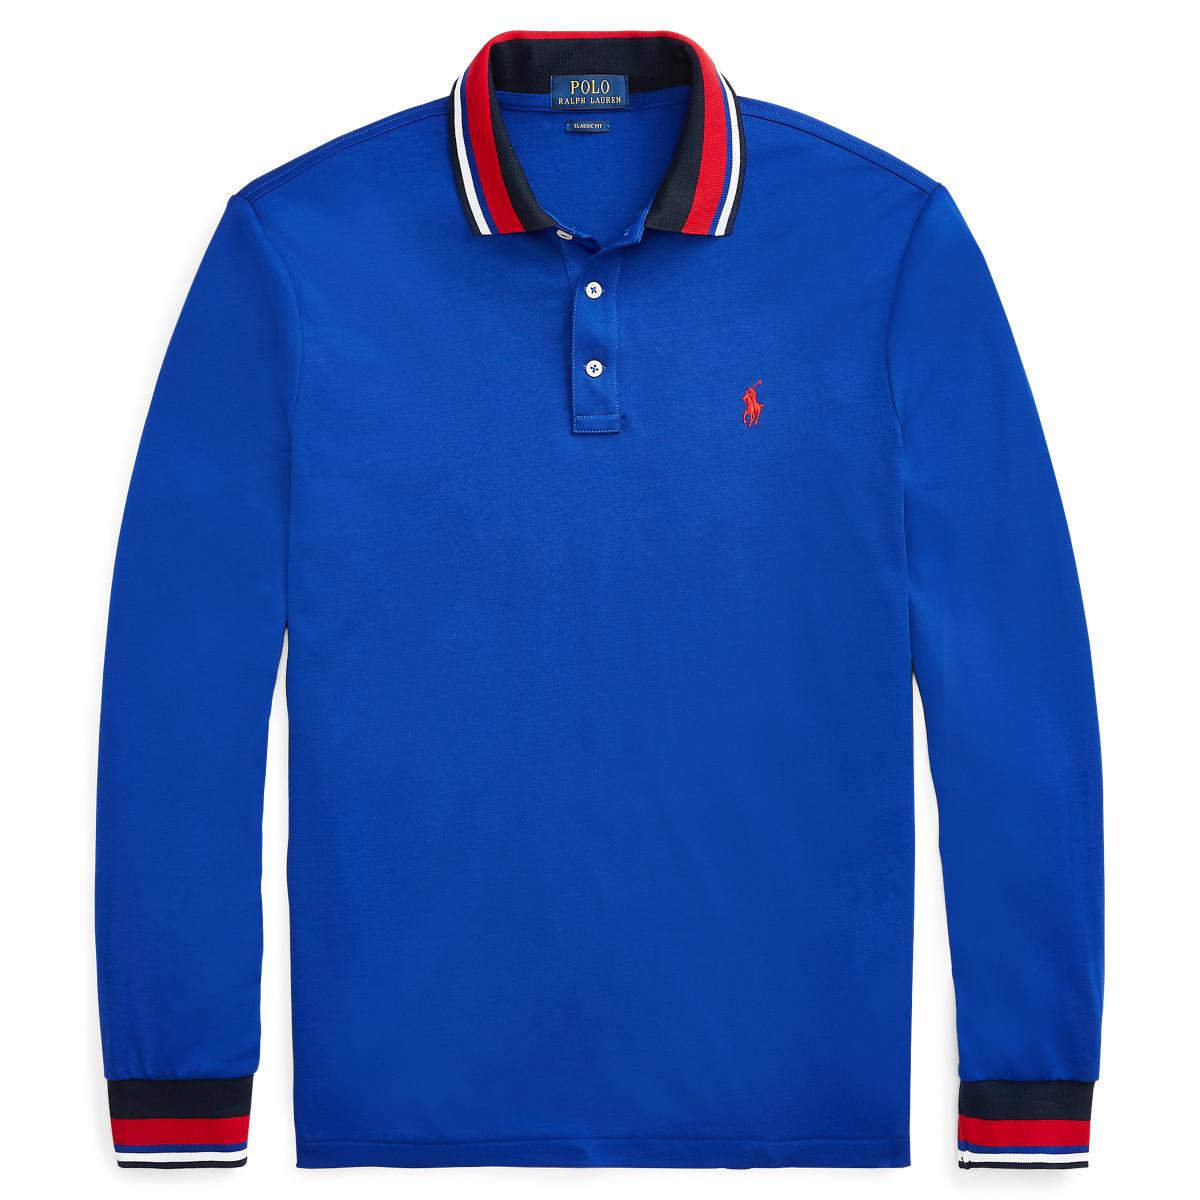 66daebd54 Custom Color Ralph Lauren Polo Shirts - DREAMWORKS